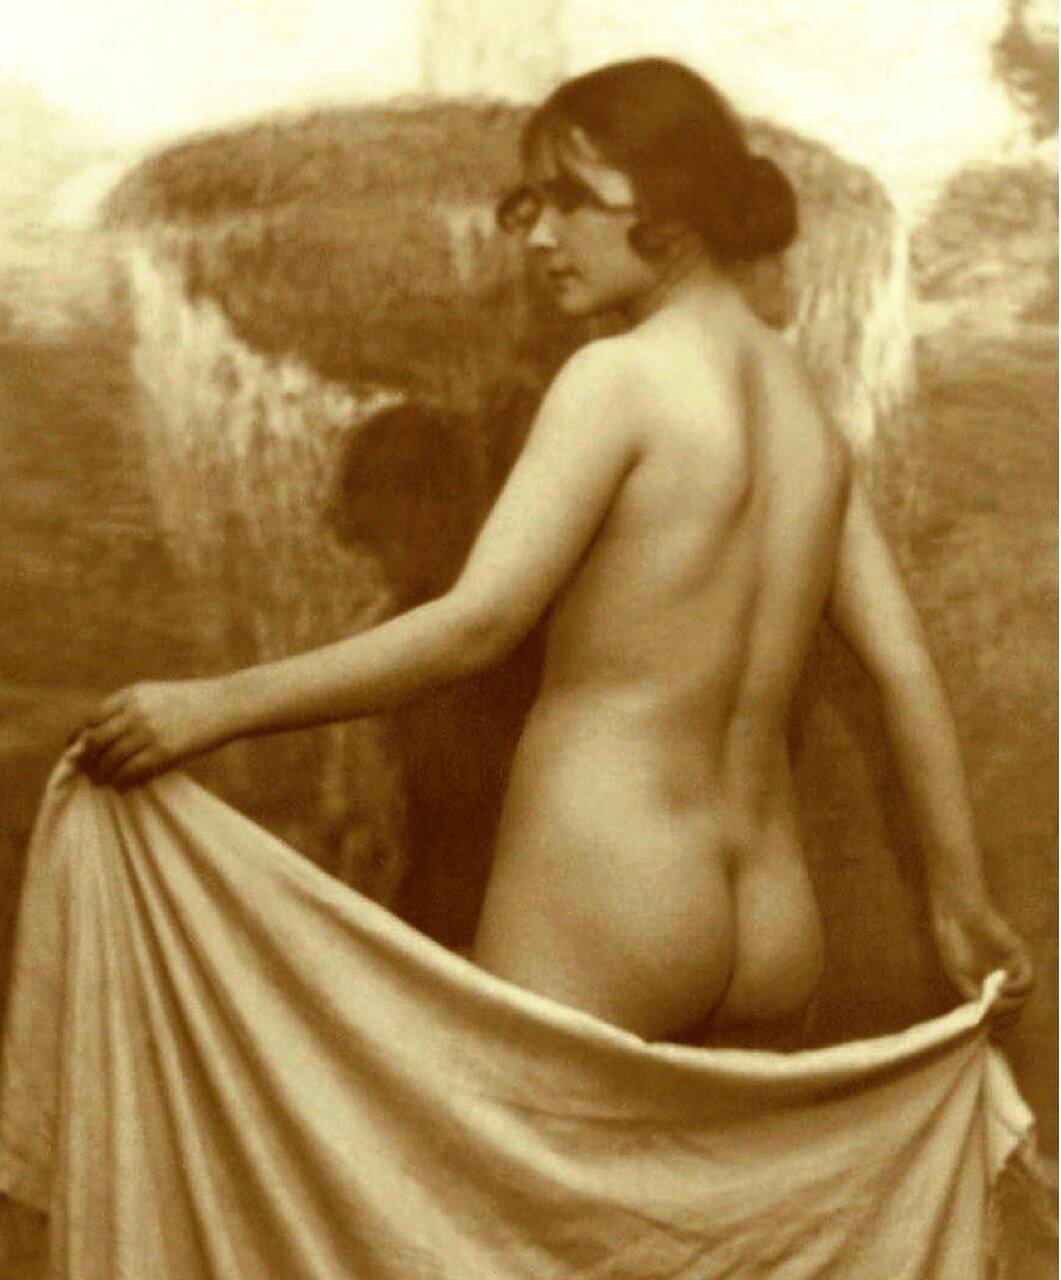 Секс с лилеи 10 фотография